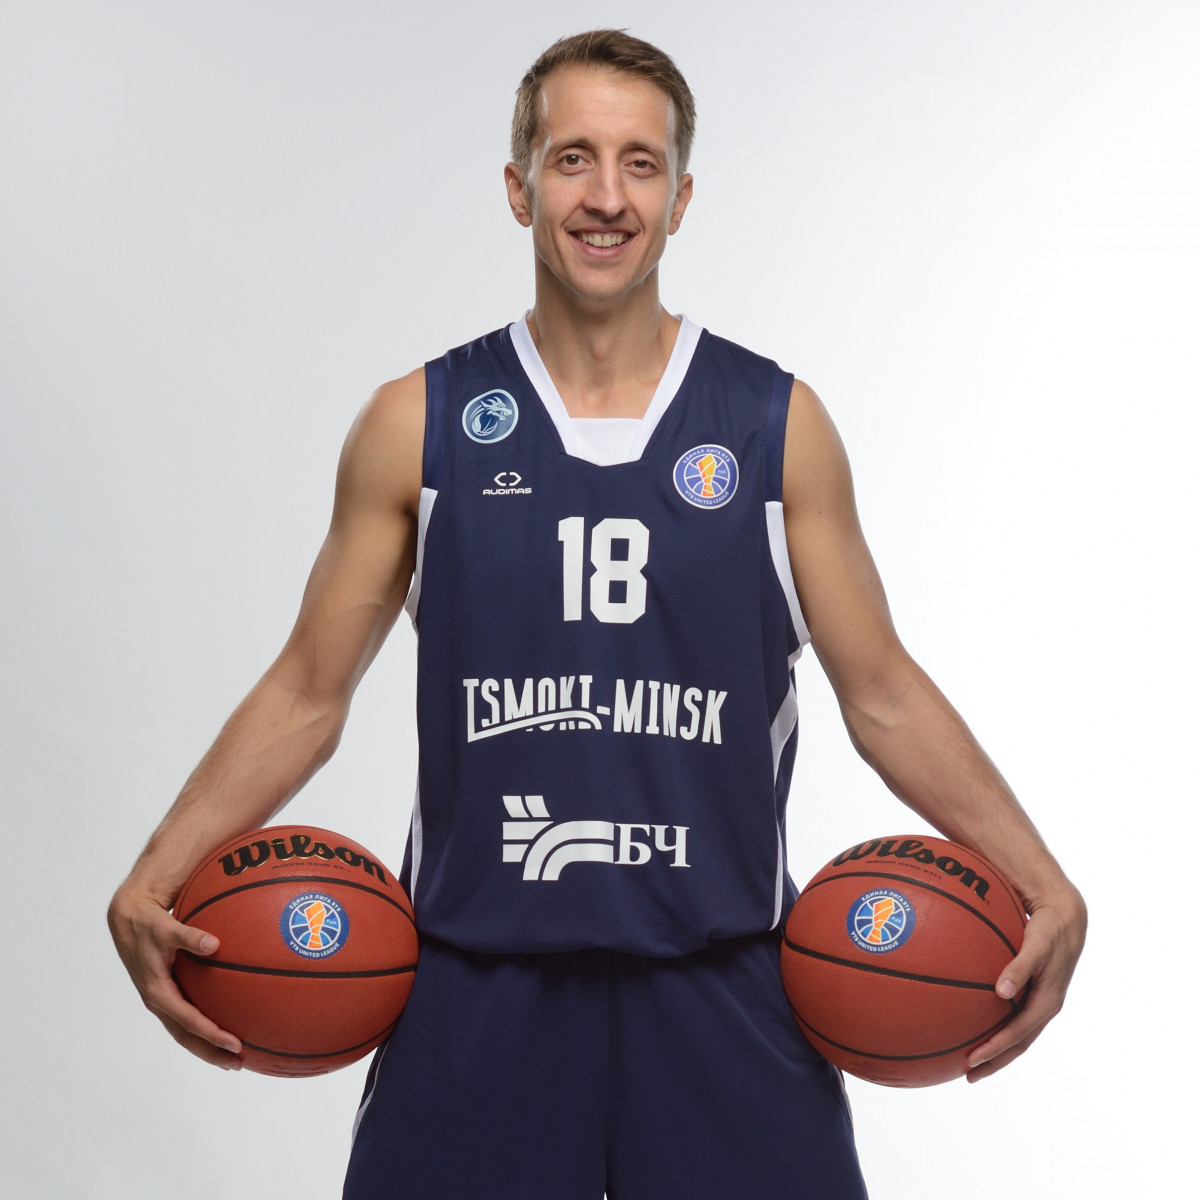 Photo of Branko Mirkovic, 2019-2020 season